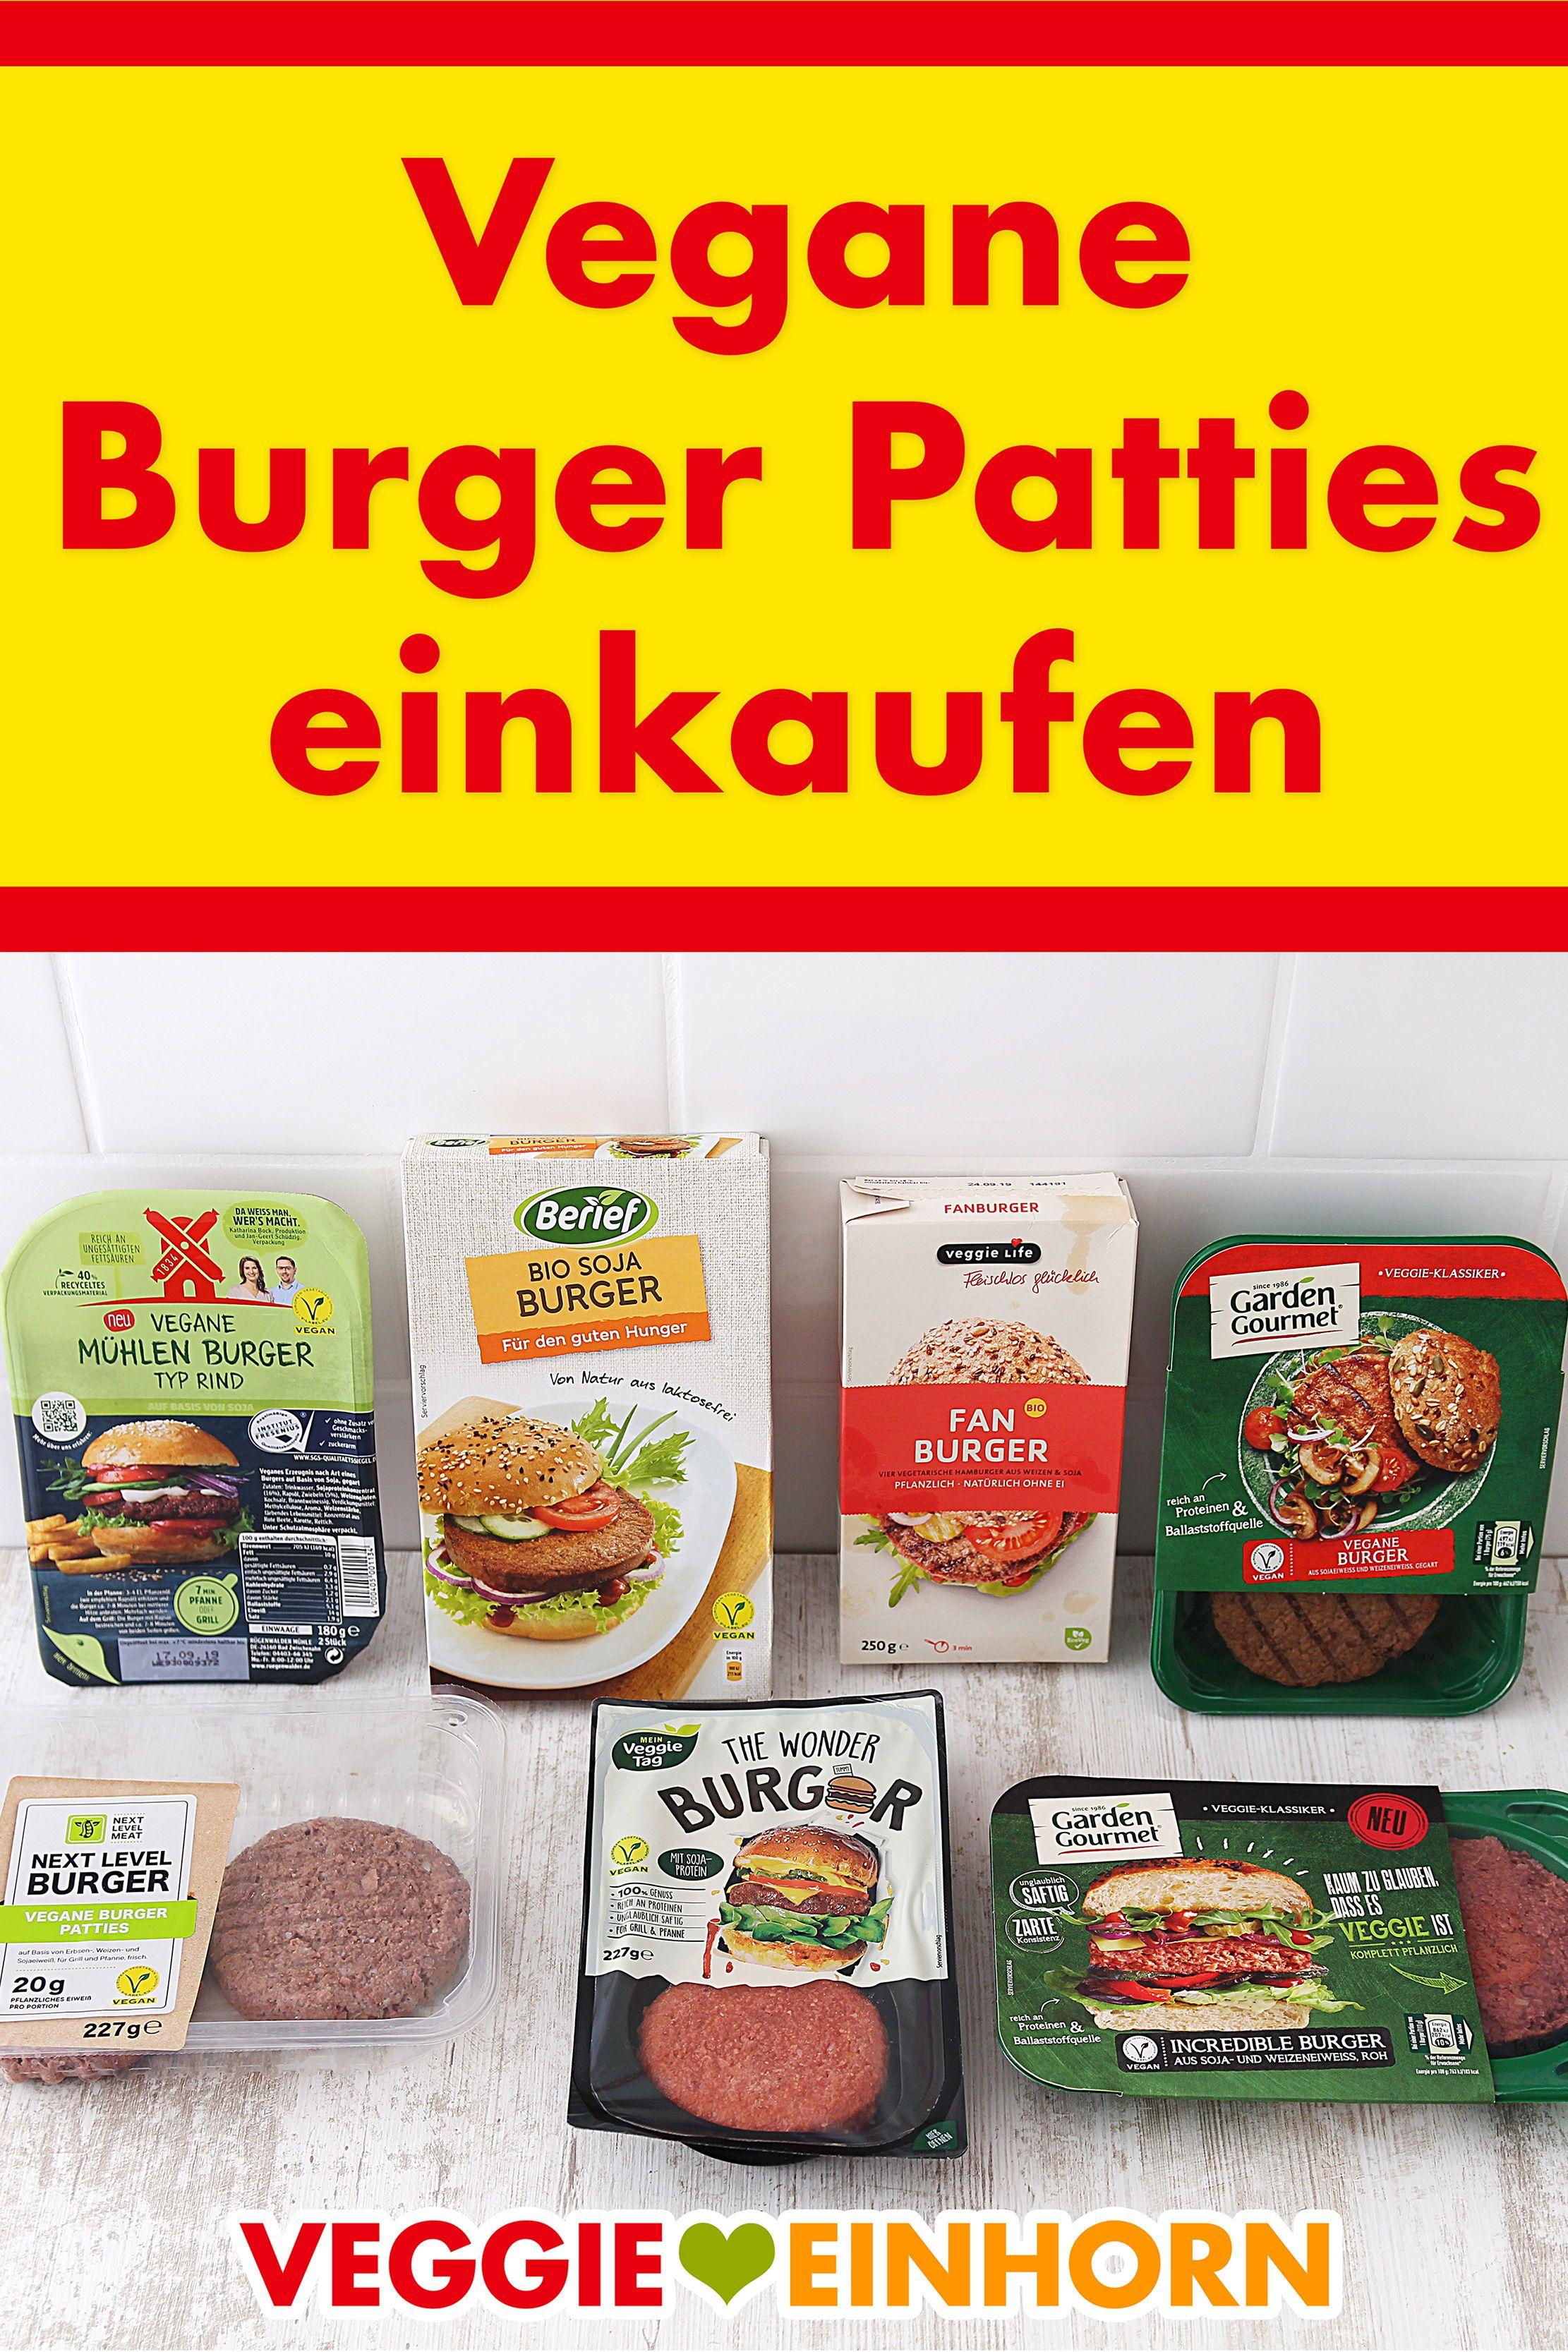 Vegane Burger Patties aus dem Supermarkt  Vegane lebensmittel